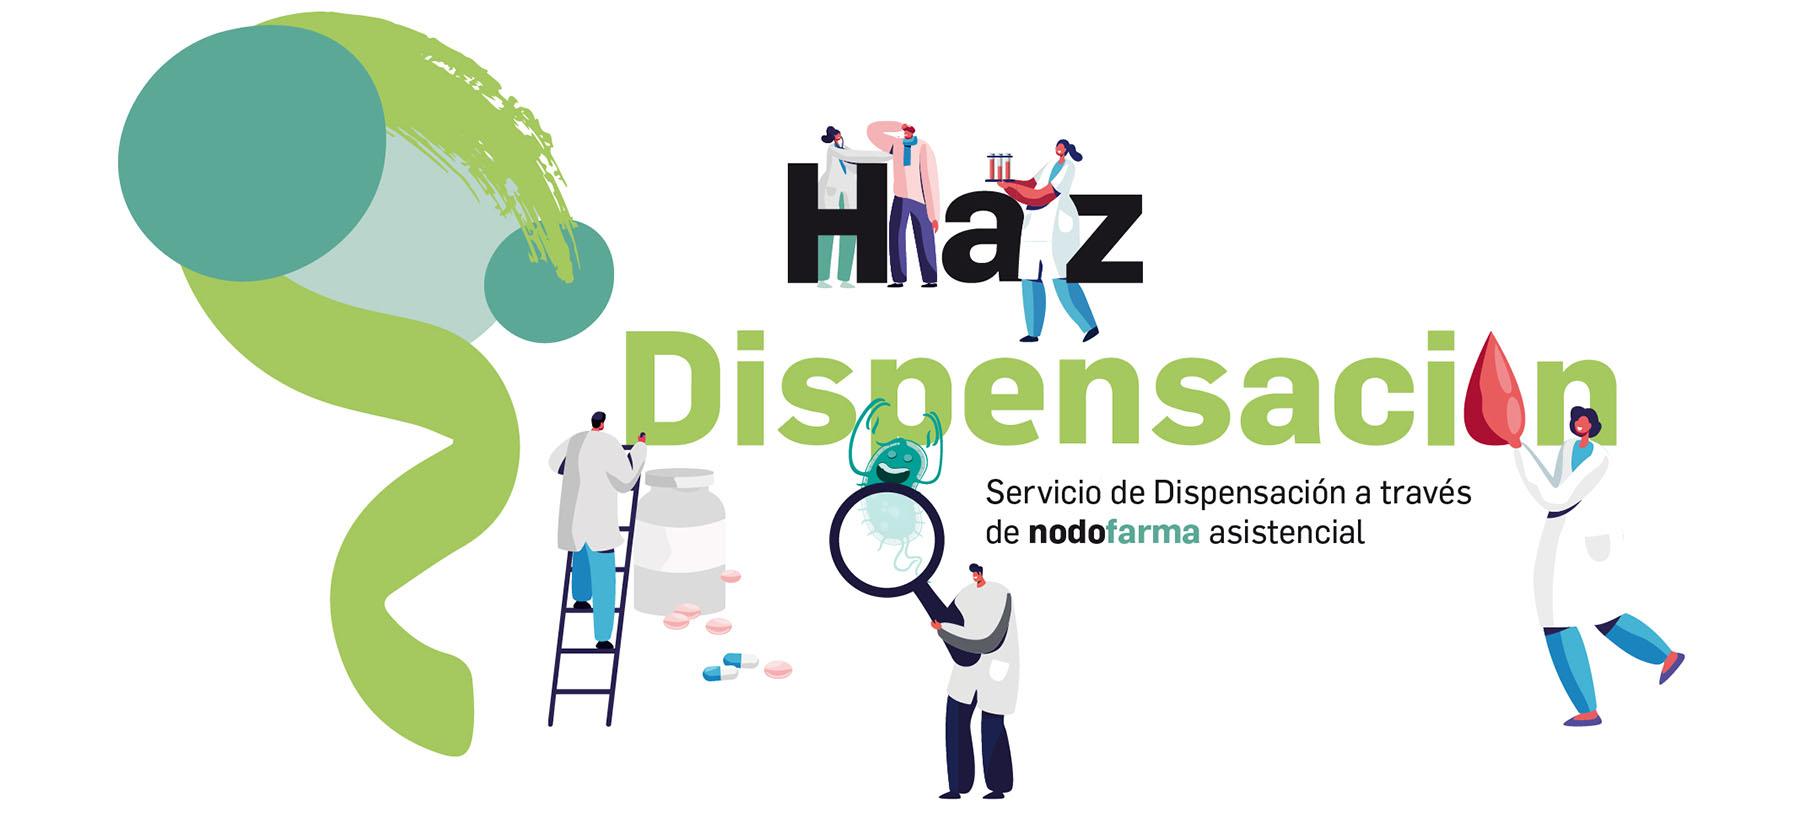 Course Image HazDispensación: Servicio de Dispensación a través de nodofarma asistencial